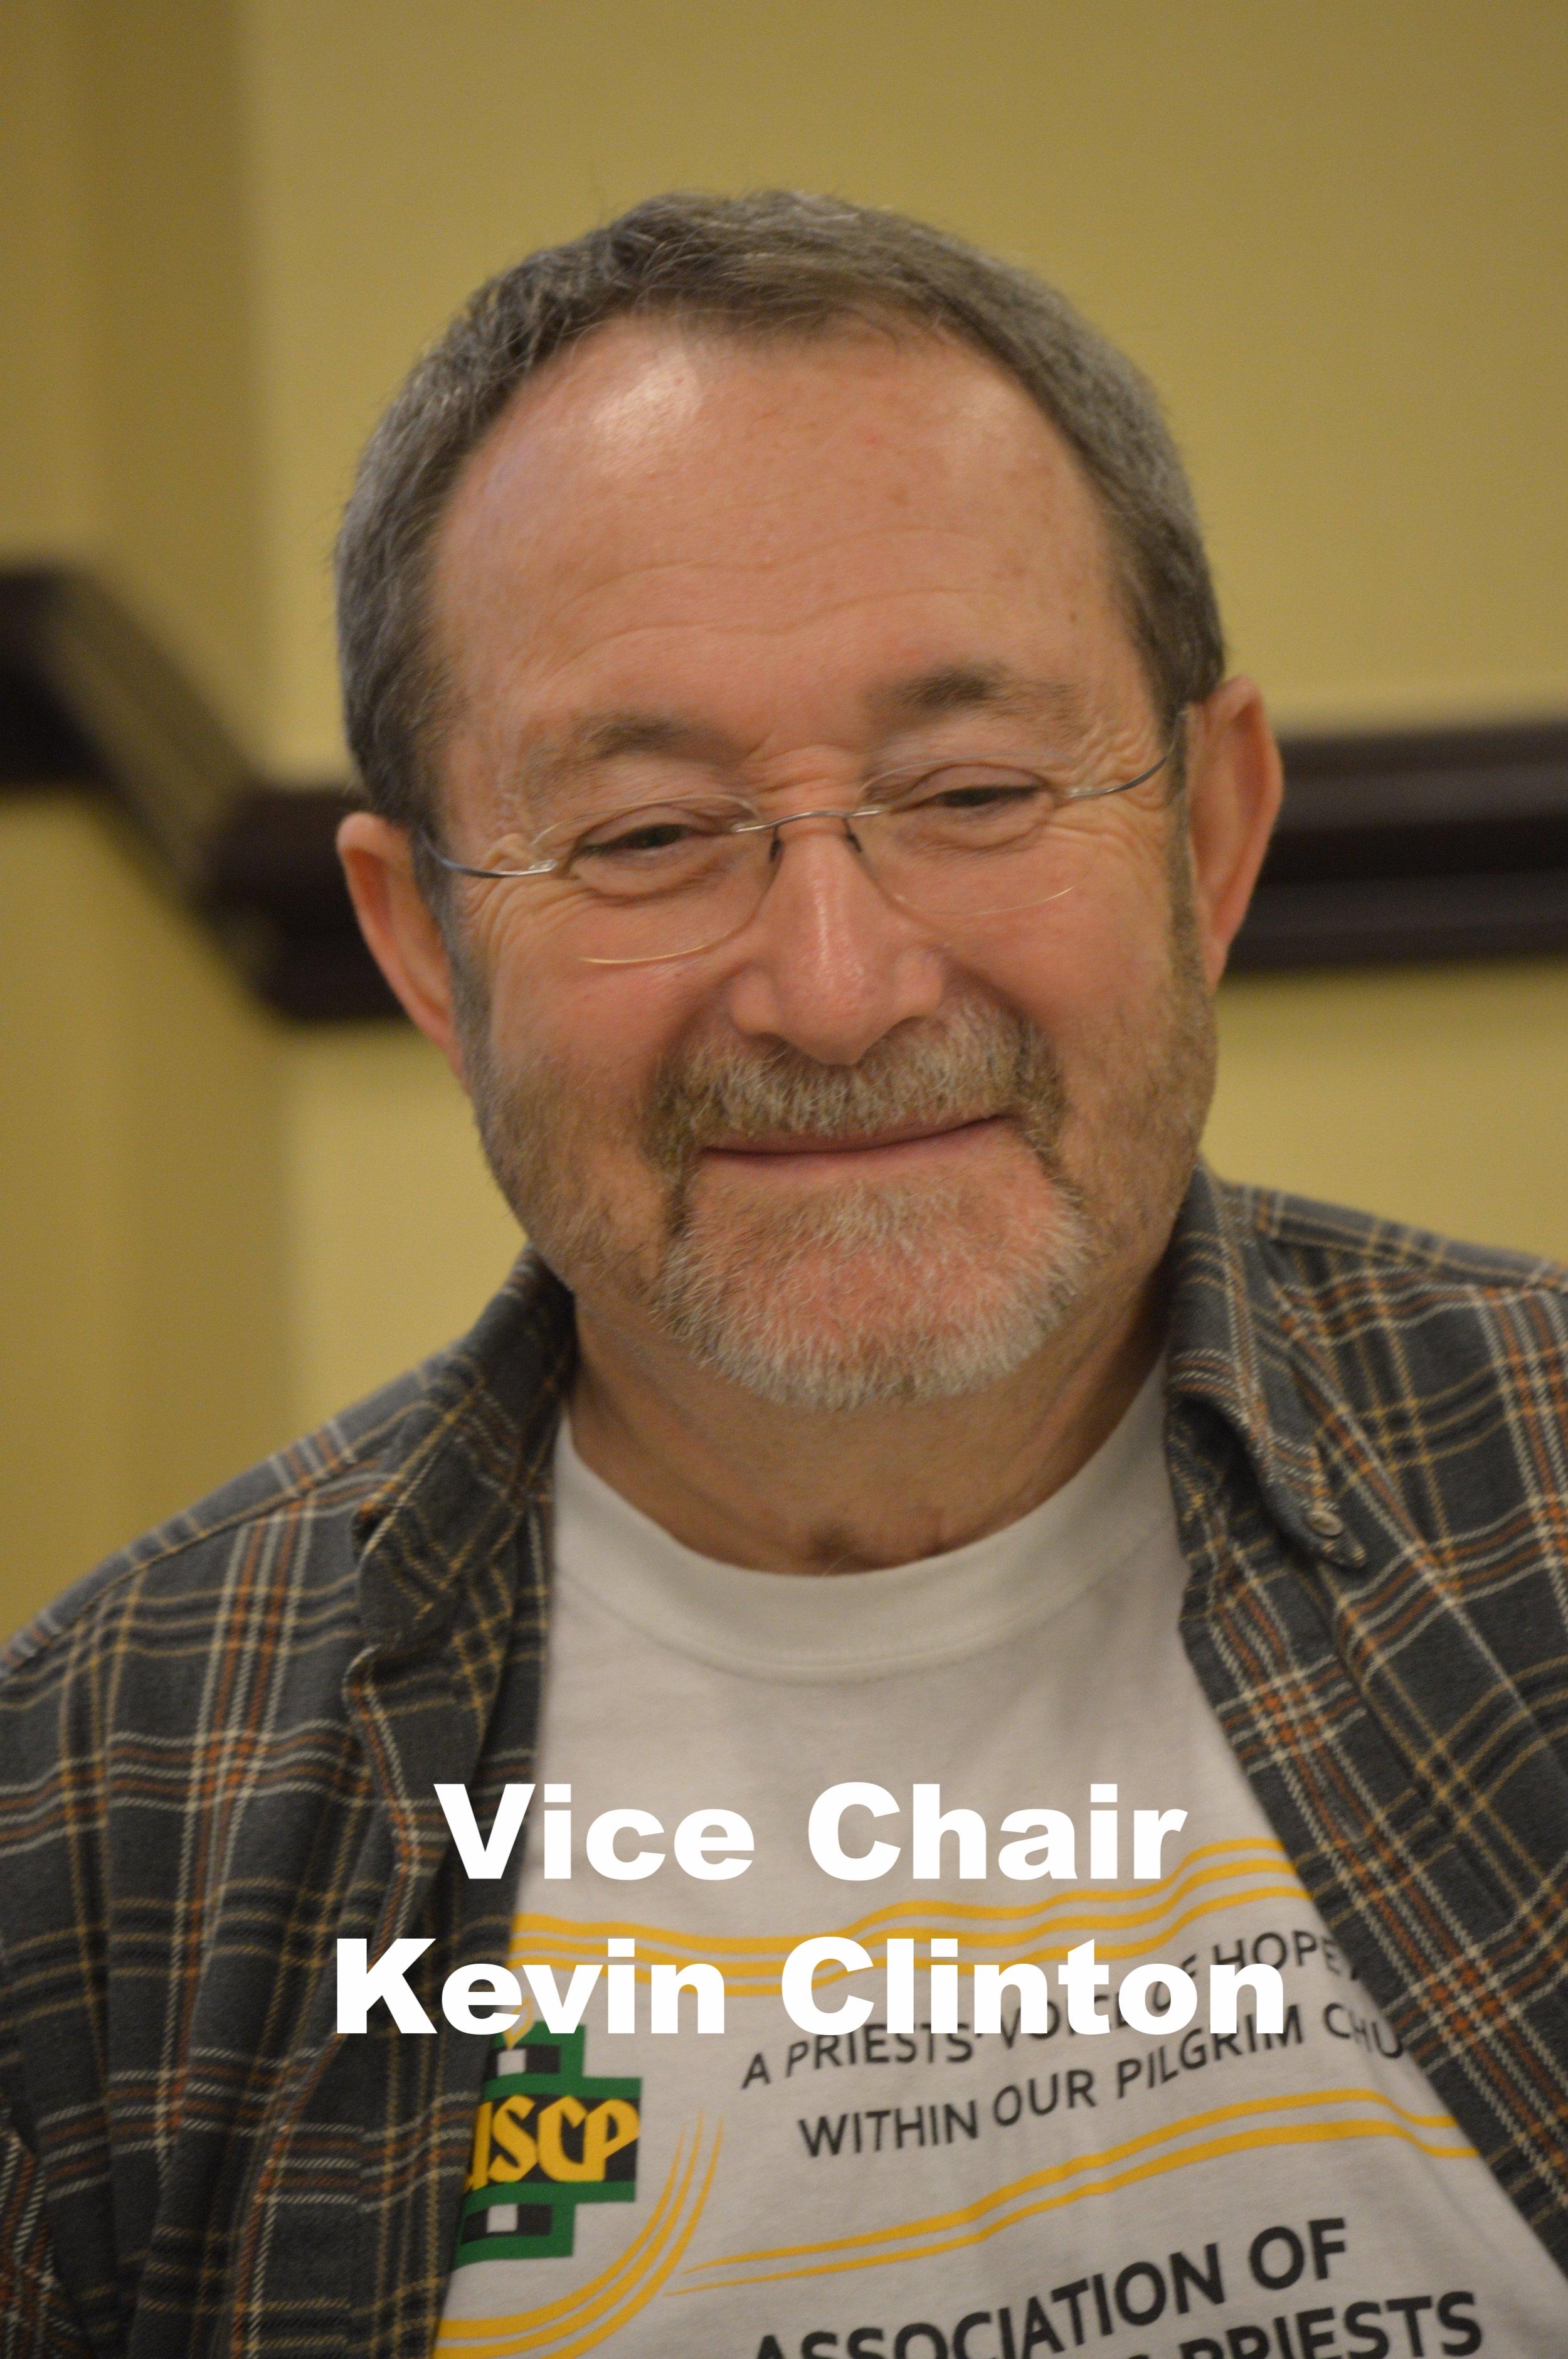 ViceChairClinton.jpg